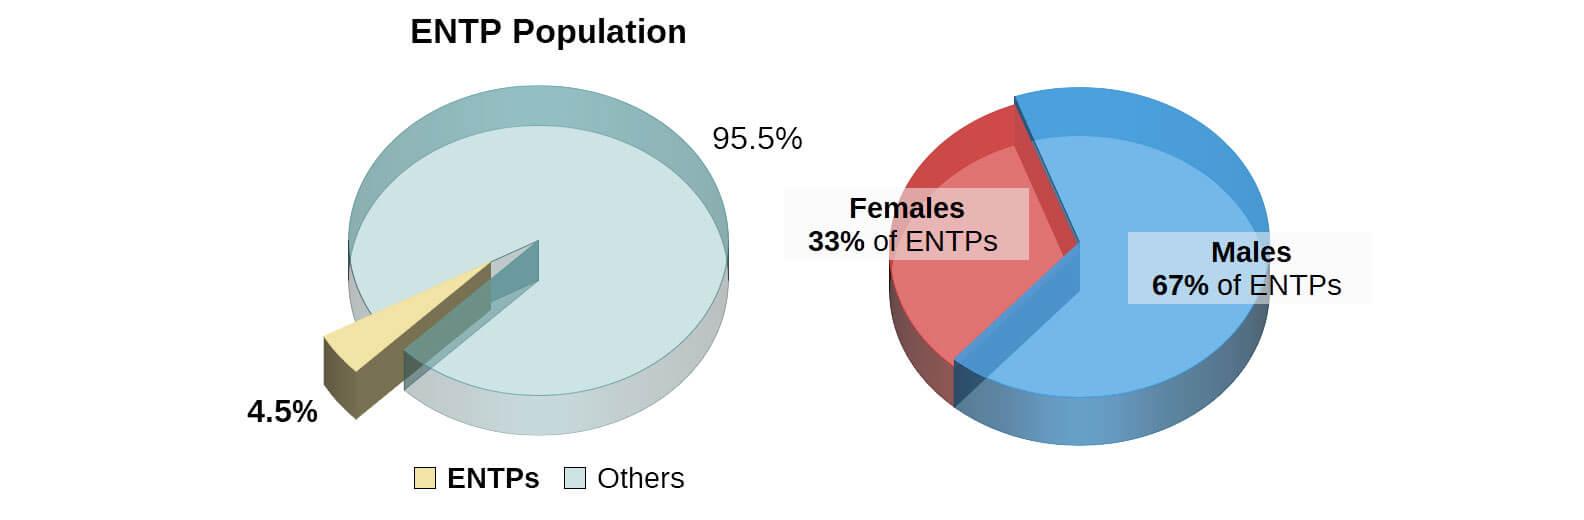 entp personality type -  u0026quot originator u0026quot  profile